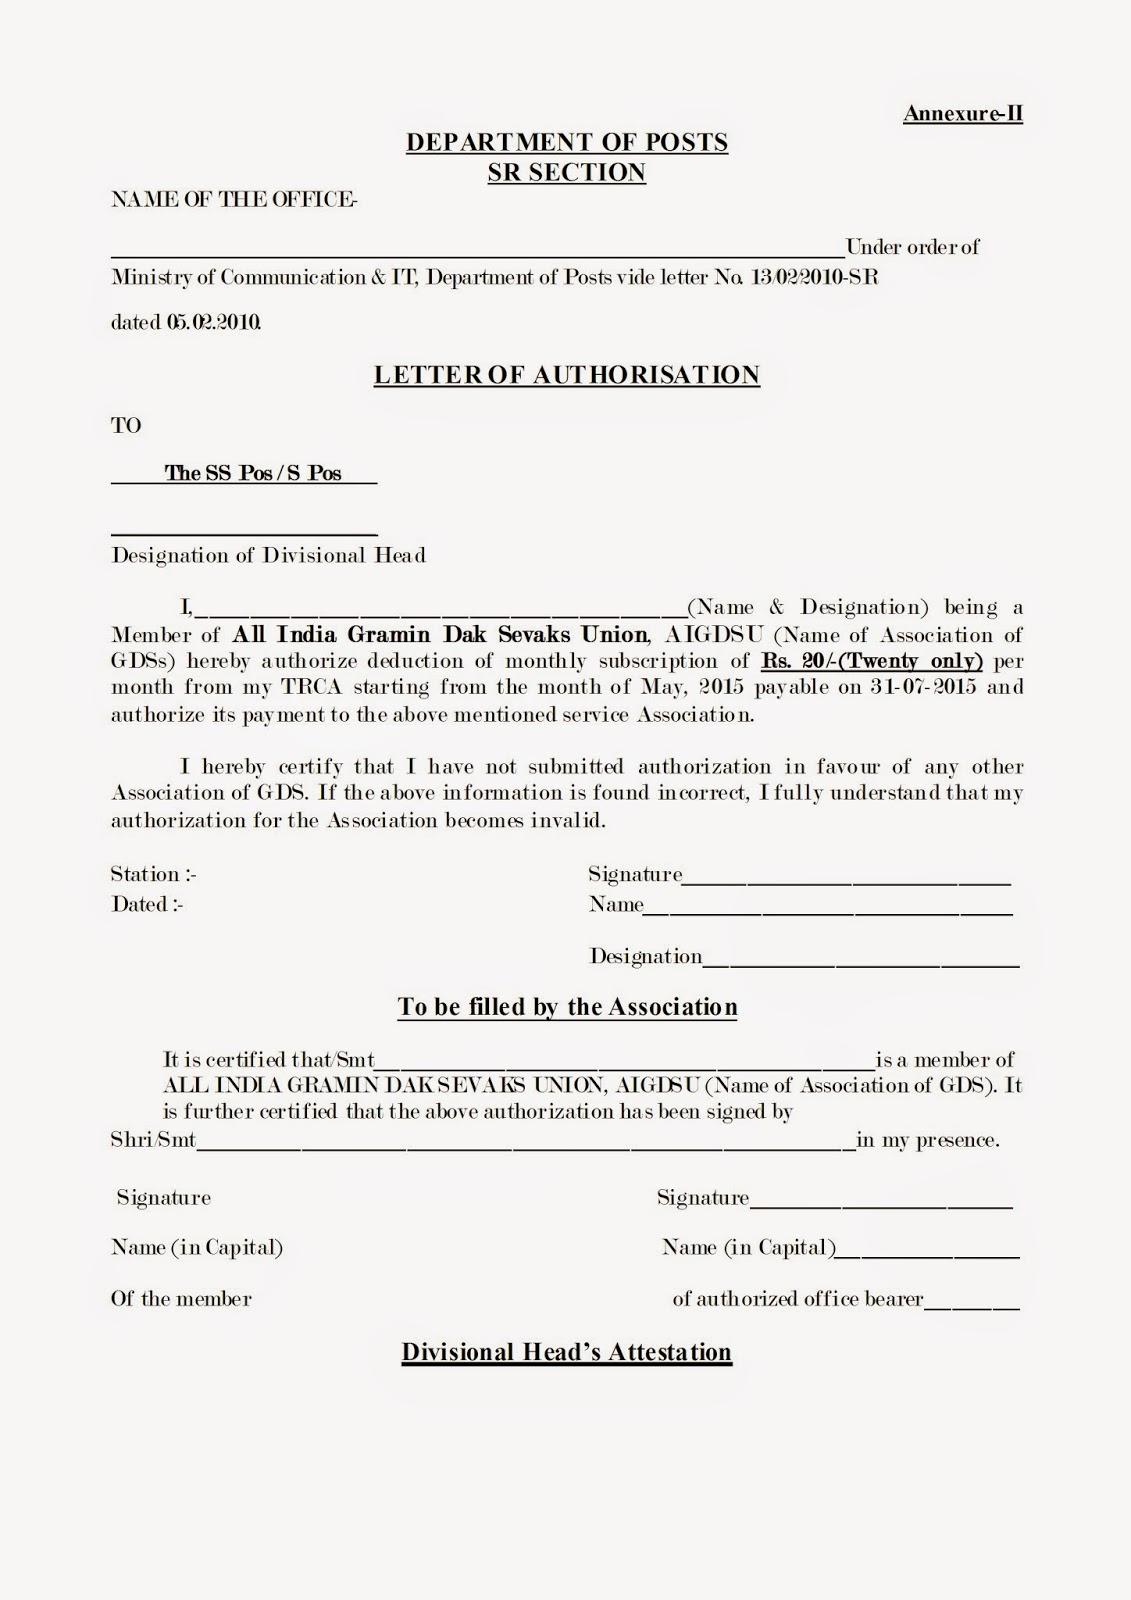 Rural Postal Employees Membership Letter Of Authorisation